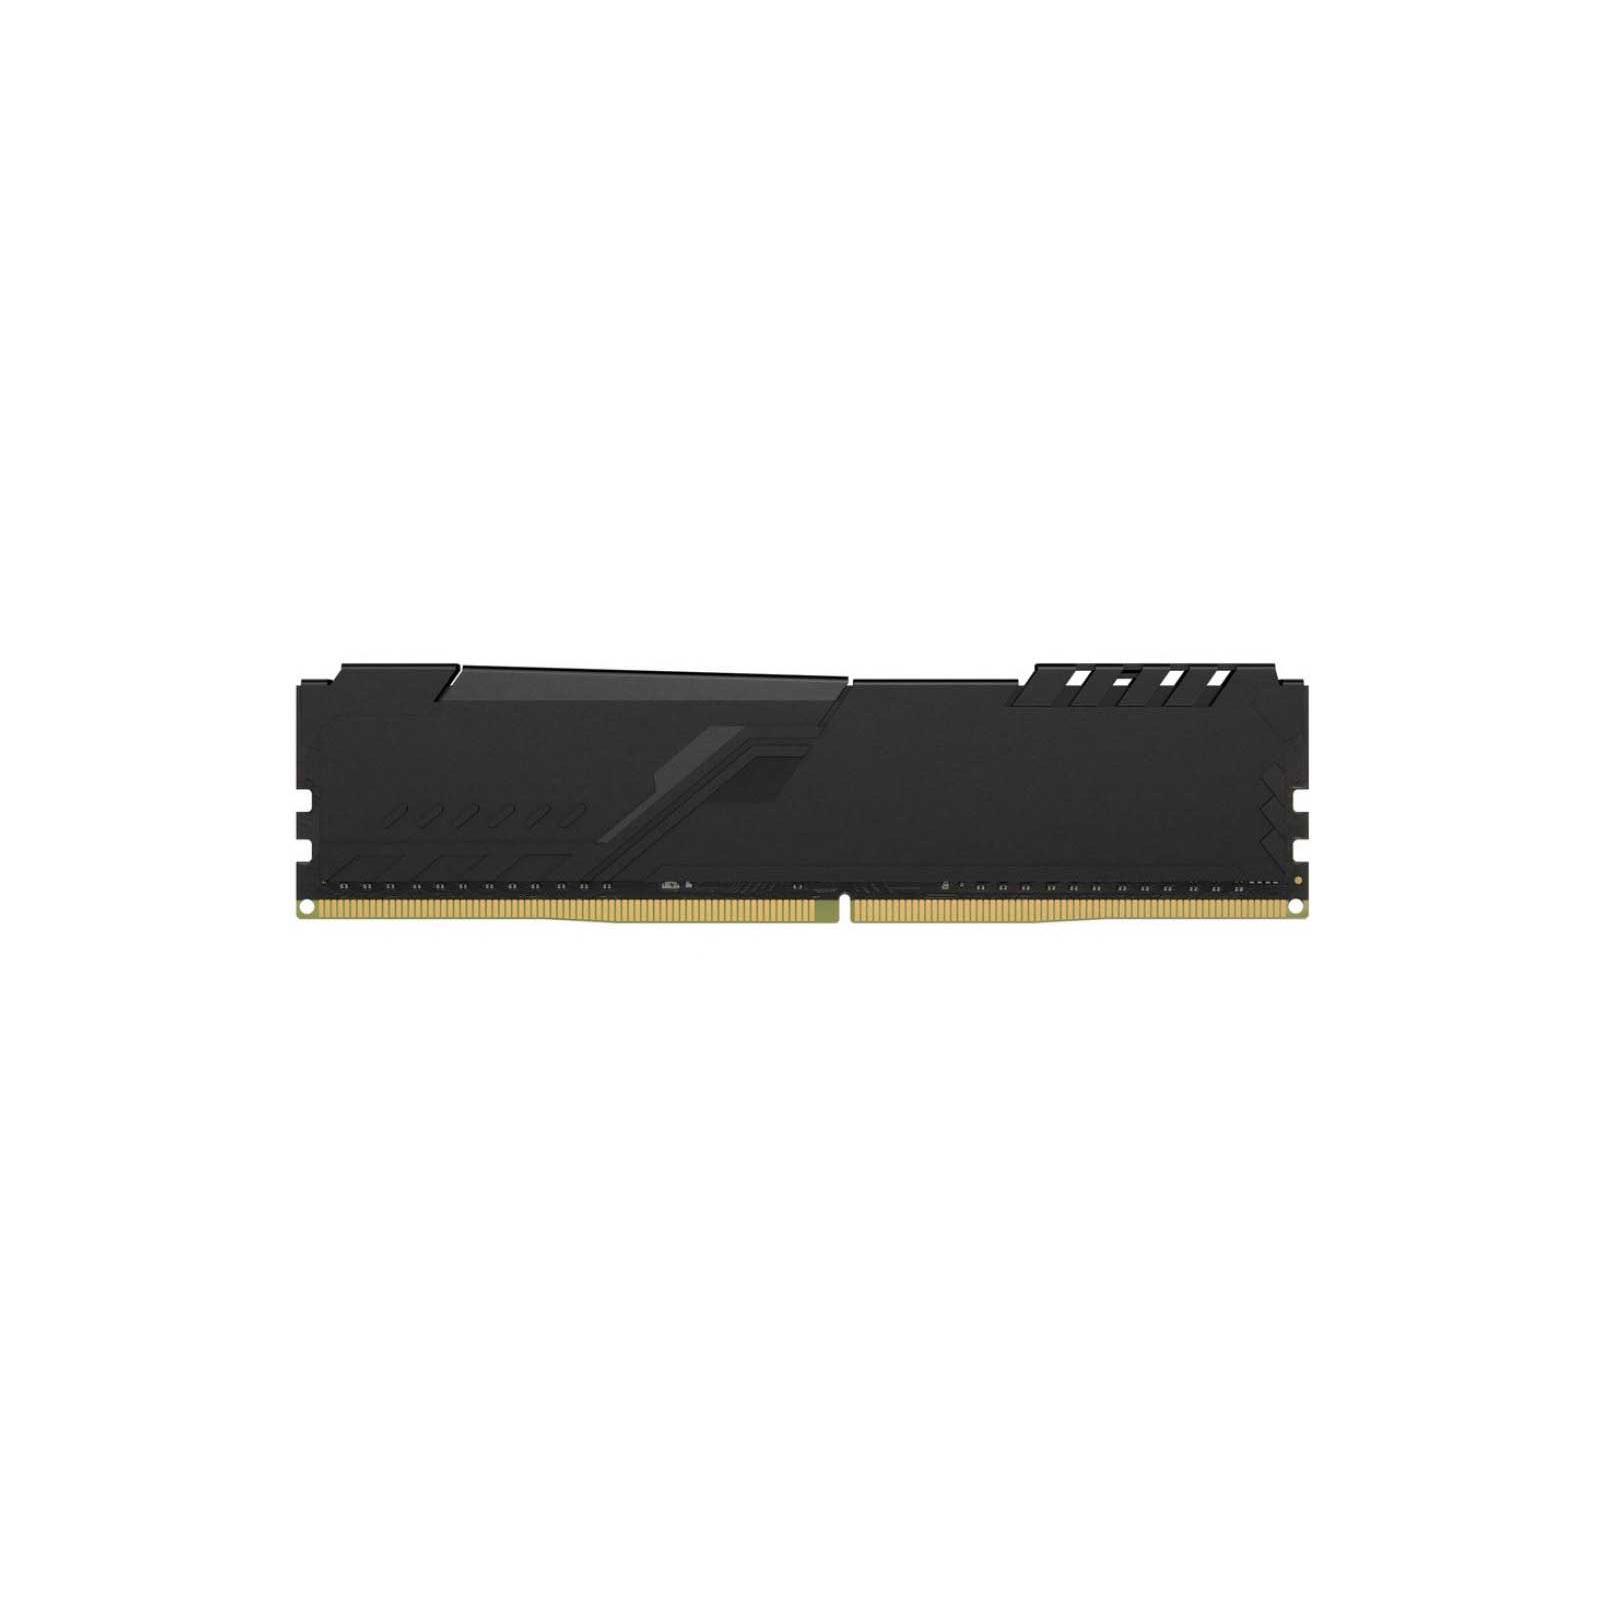 Модуль памяти для компьютера DDR4 16GB 2400 MHz HyperX FURY Black HyperX (Kingston Fury) (HX424C15FB3/16) изображение 2